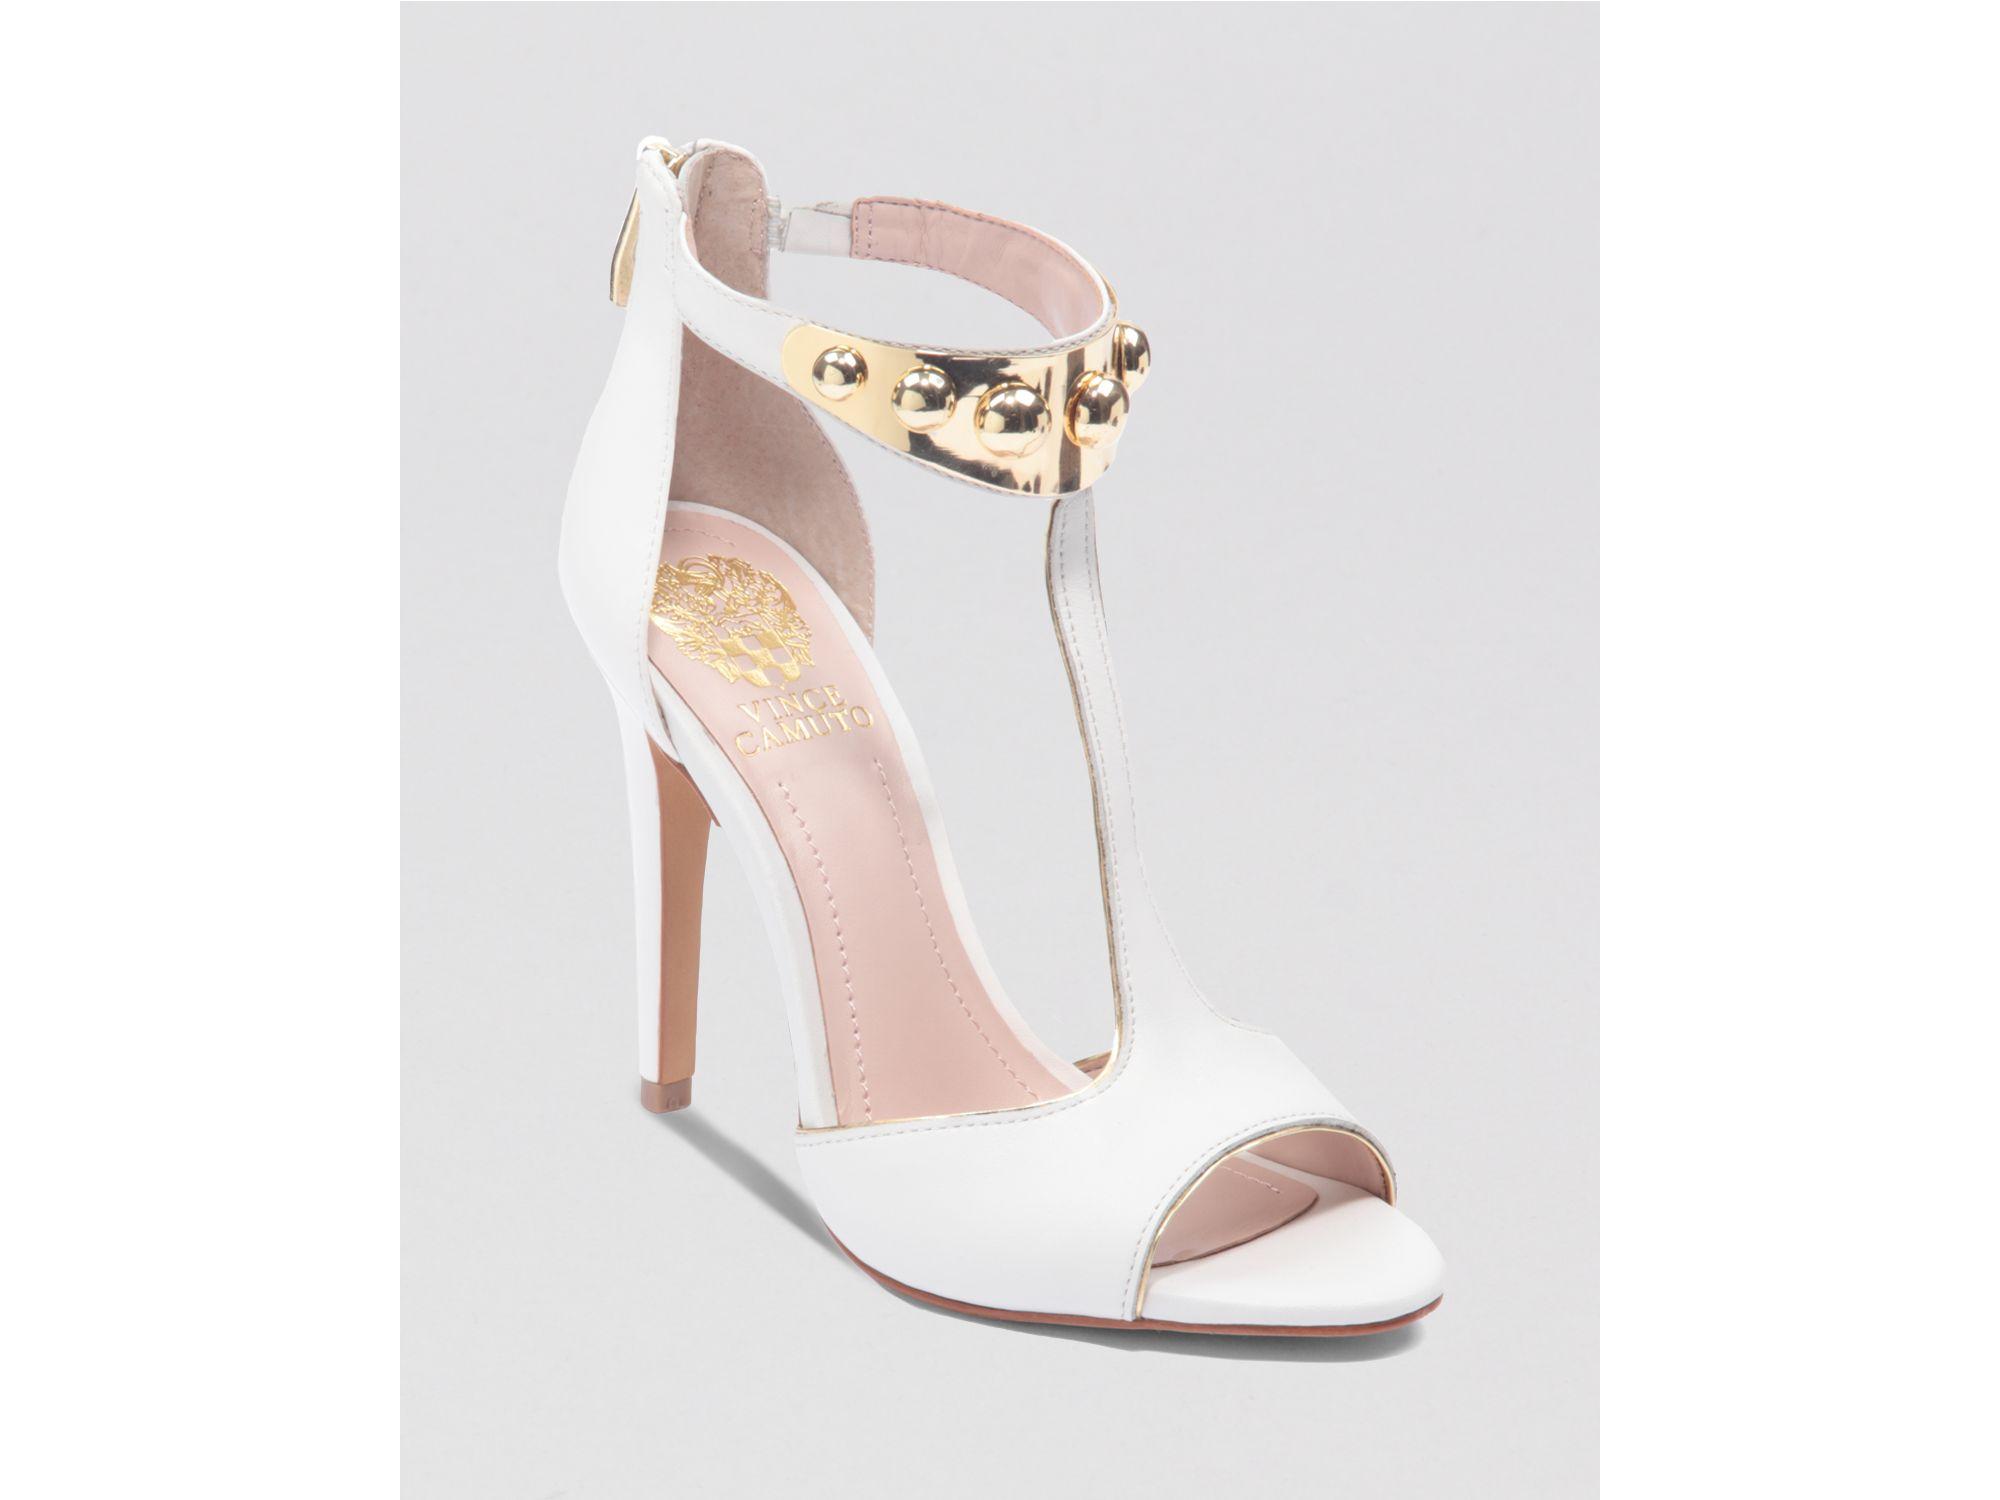 Vince Camuto Sandals Kelva High Heel In White White Gold